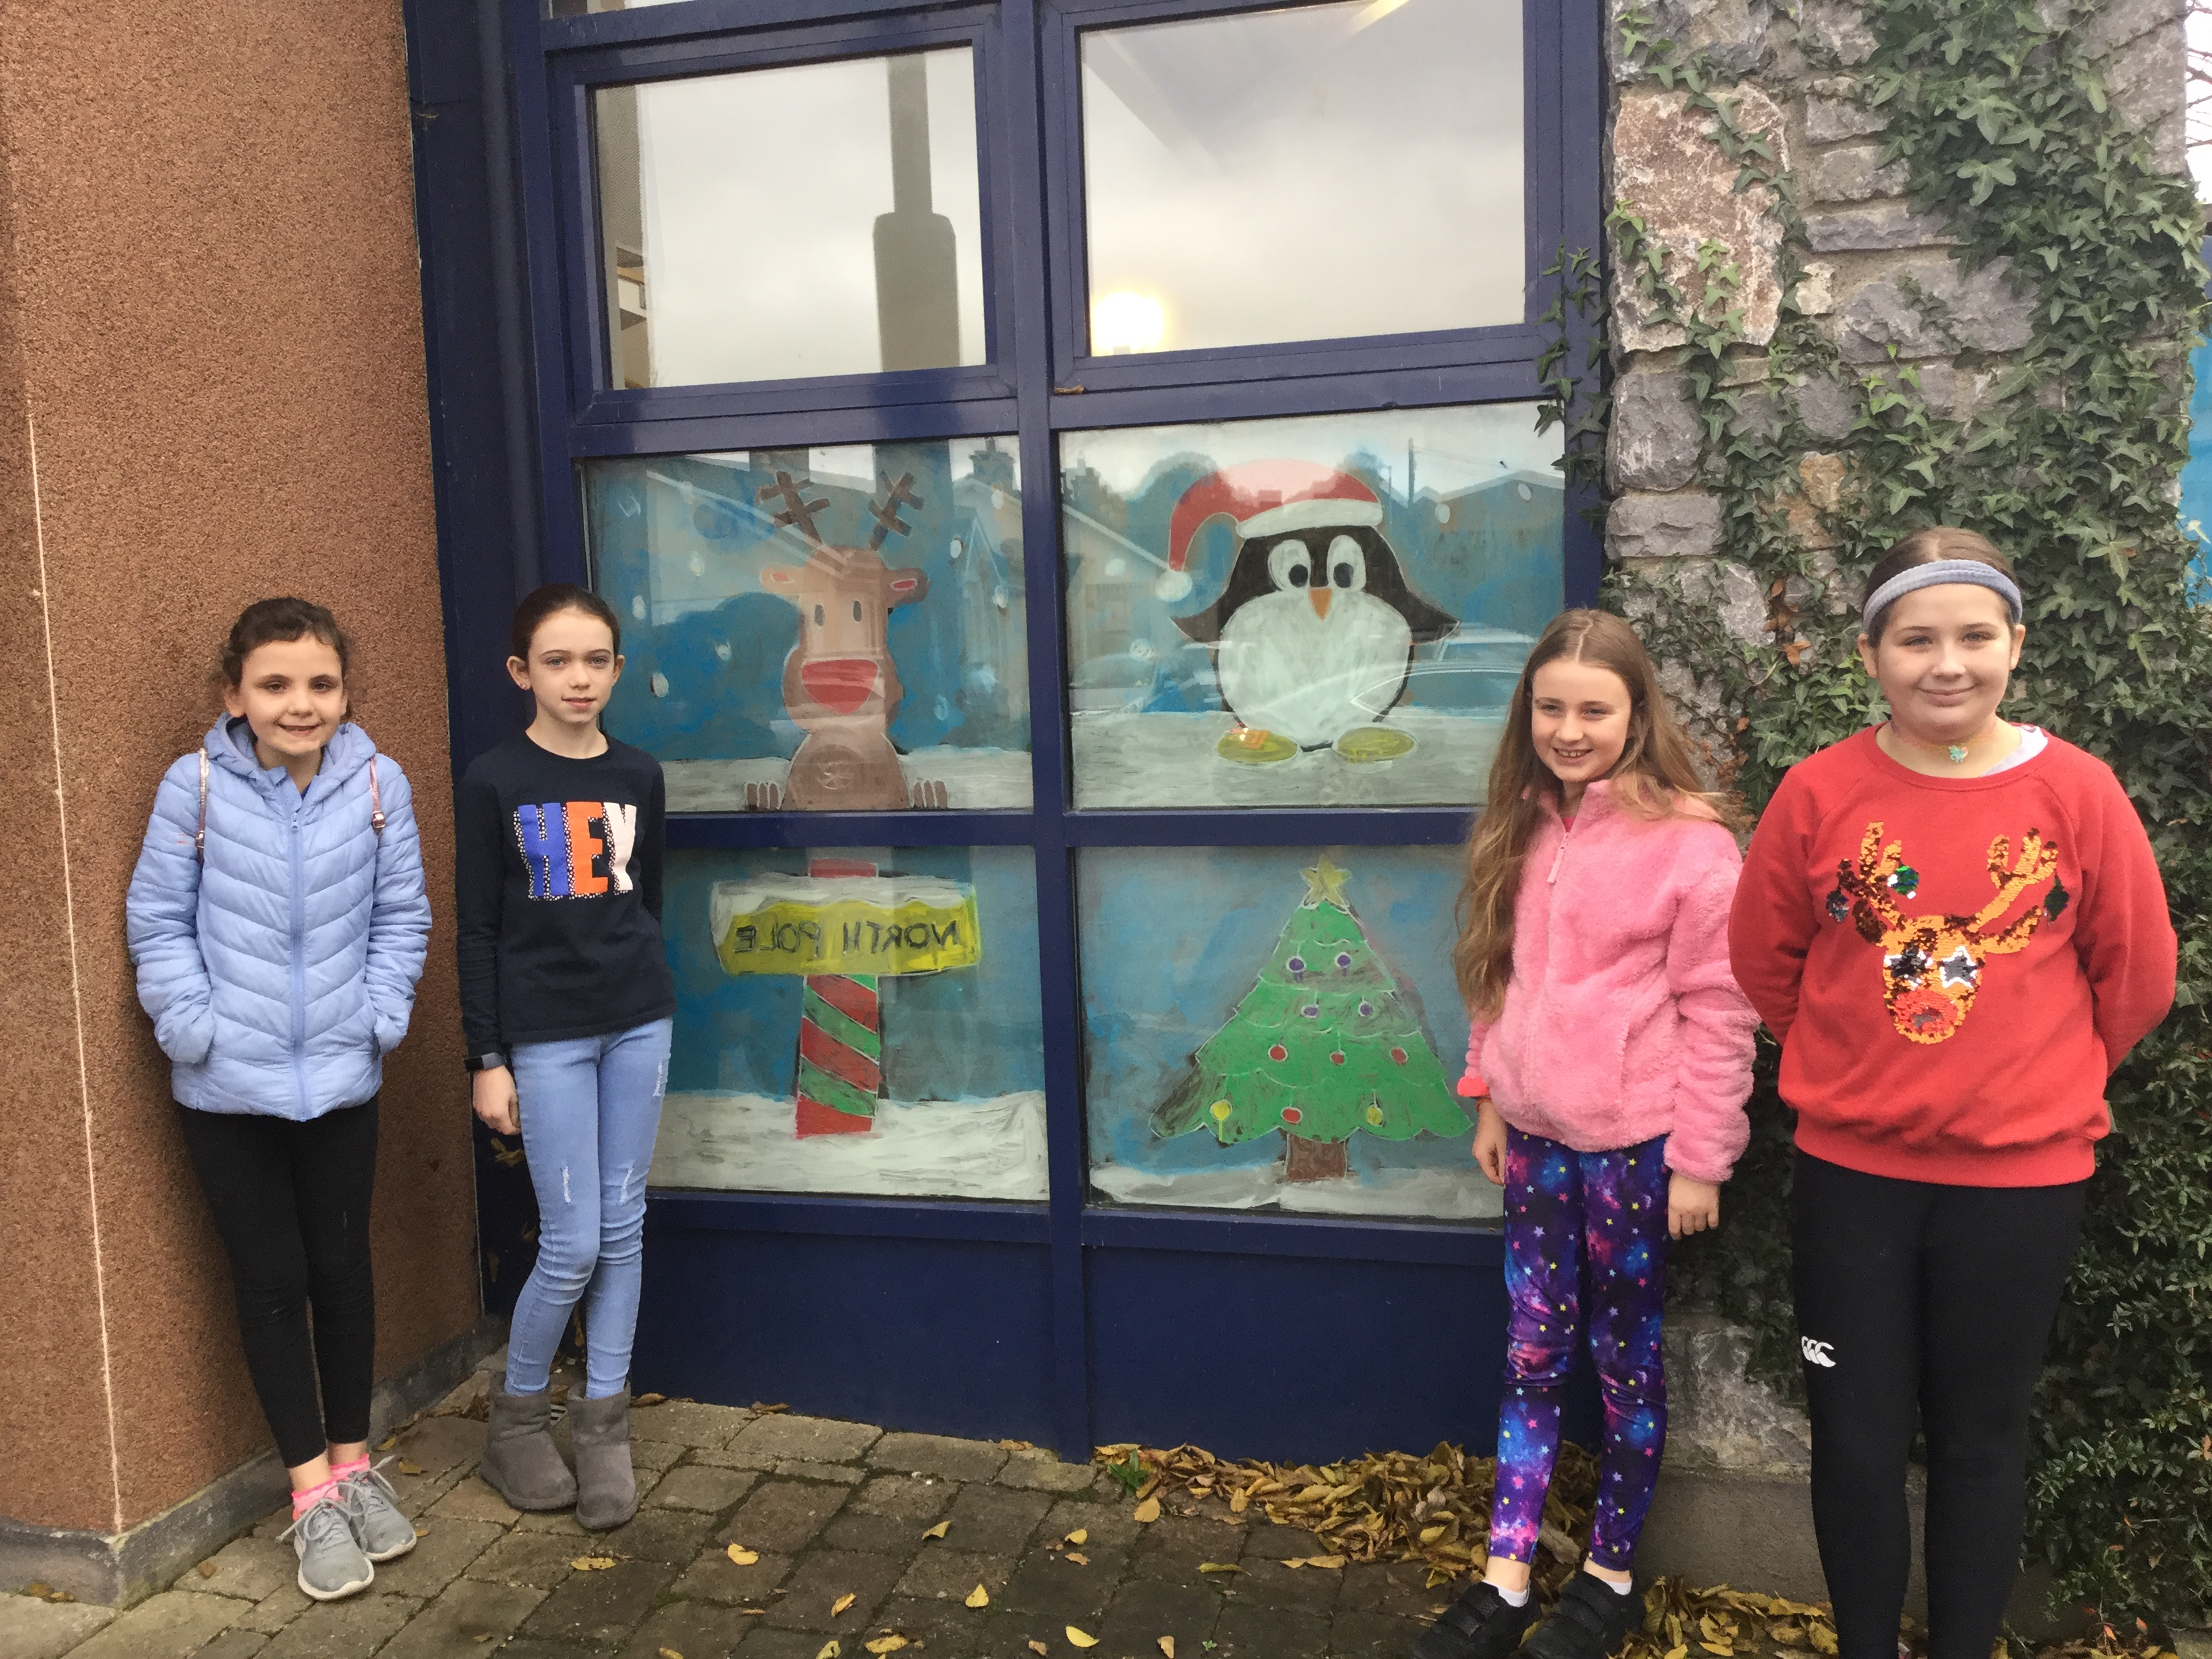 Cashel:Christmas Windows